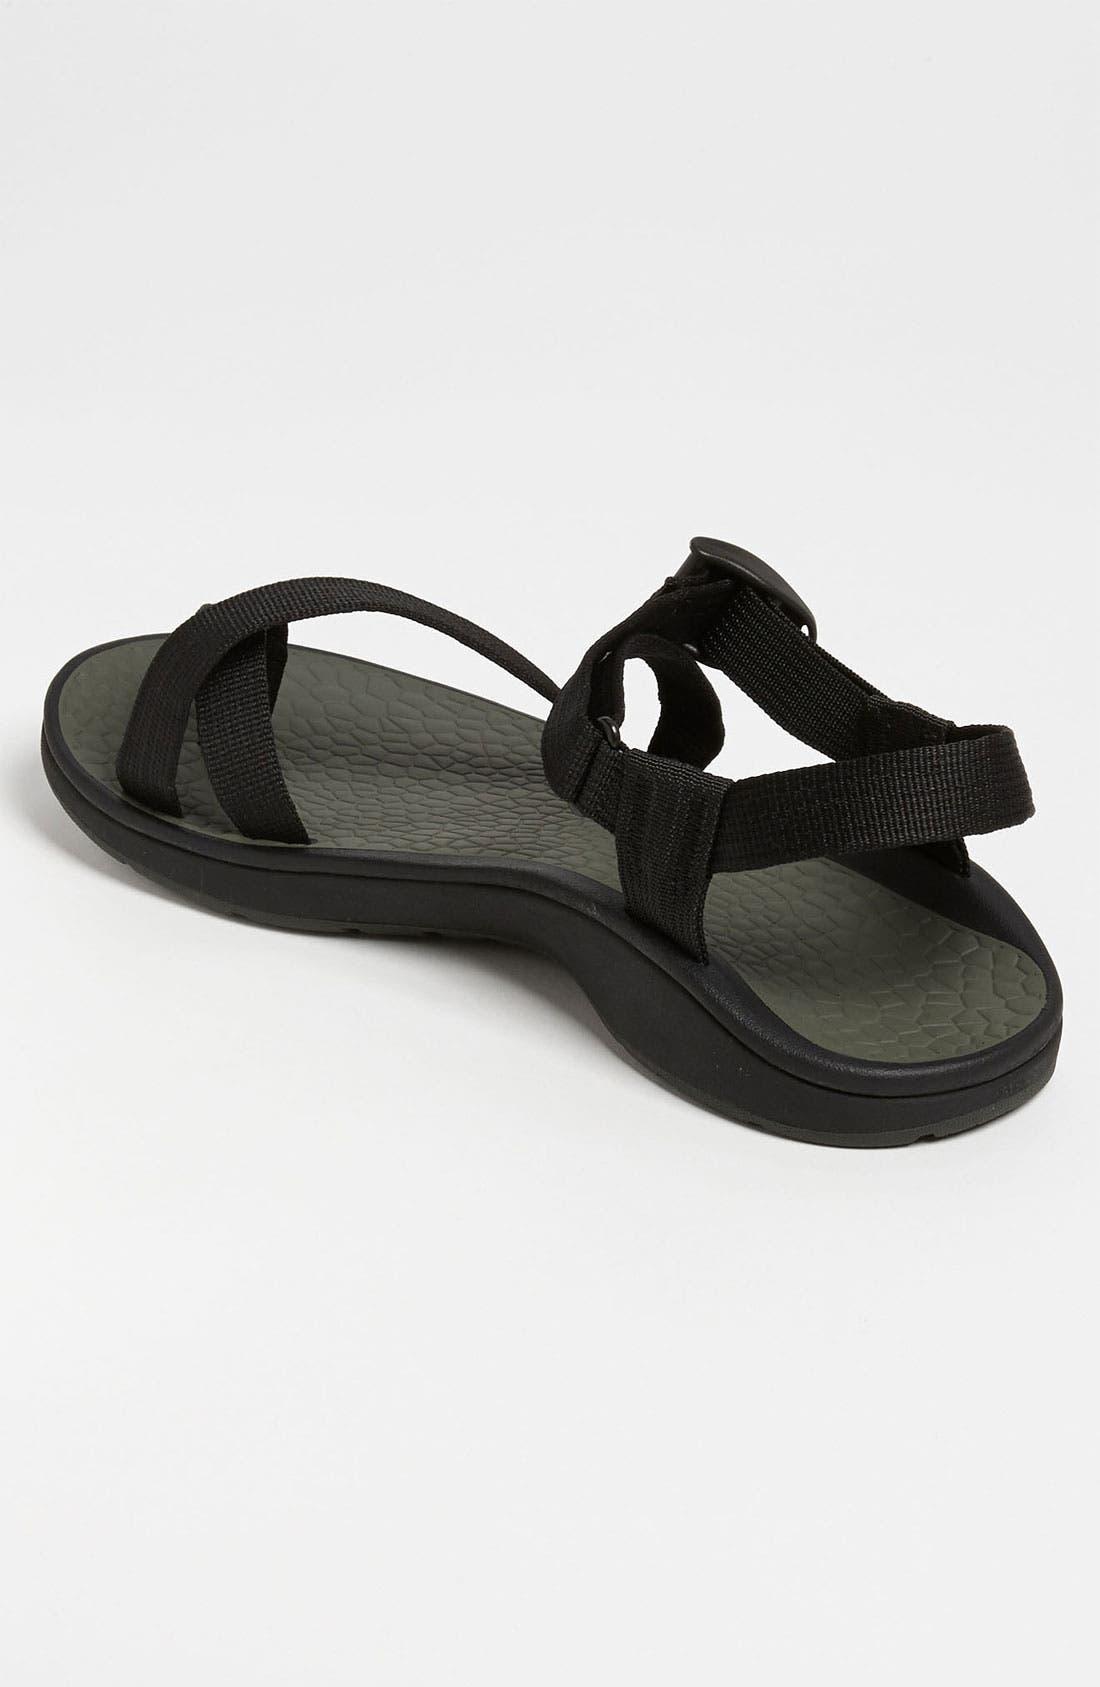 Alternate Image 2  - Chaco 'Rex' Sandal (Men)